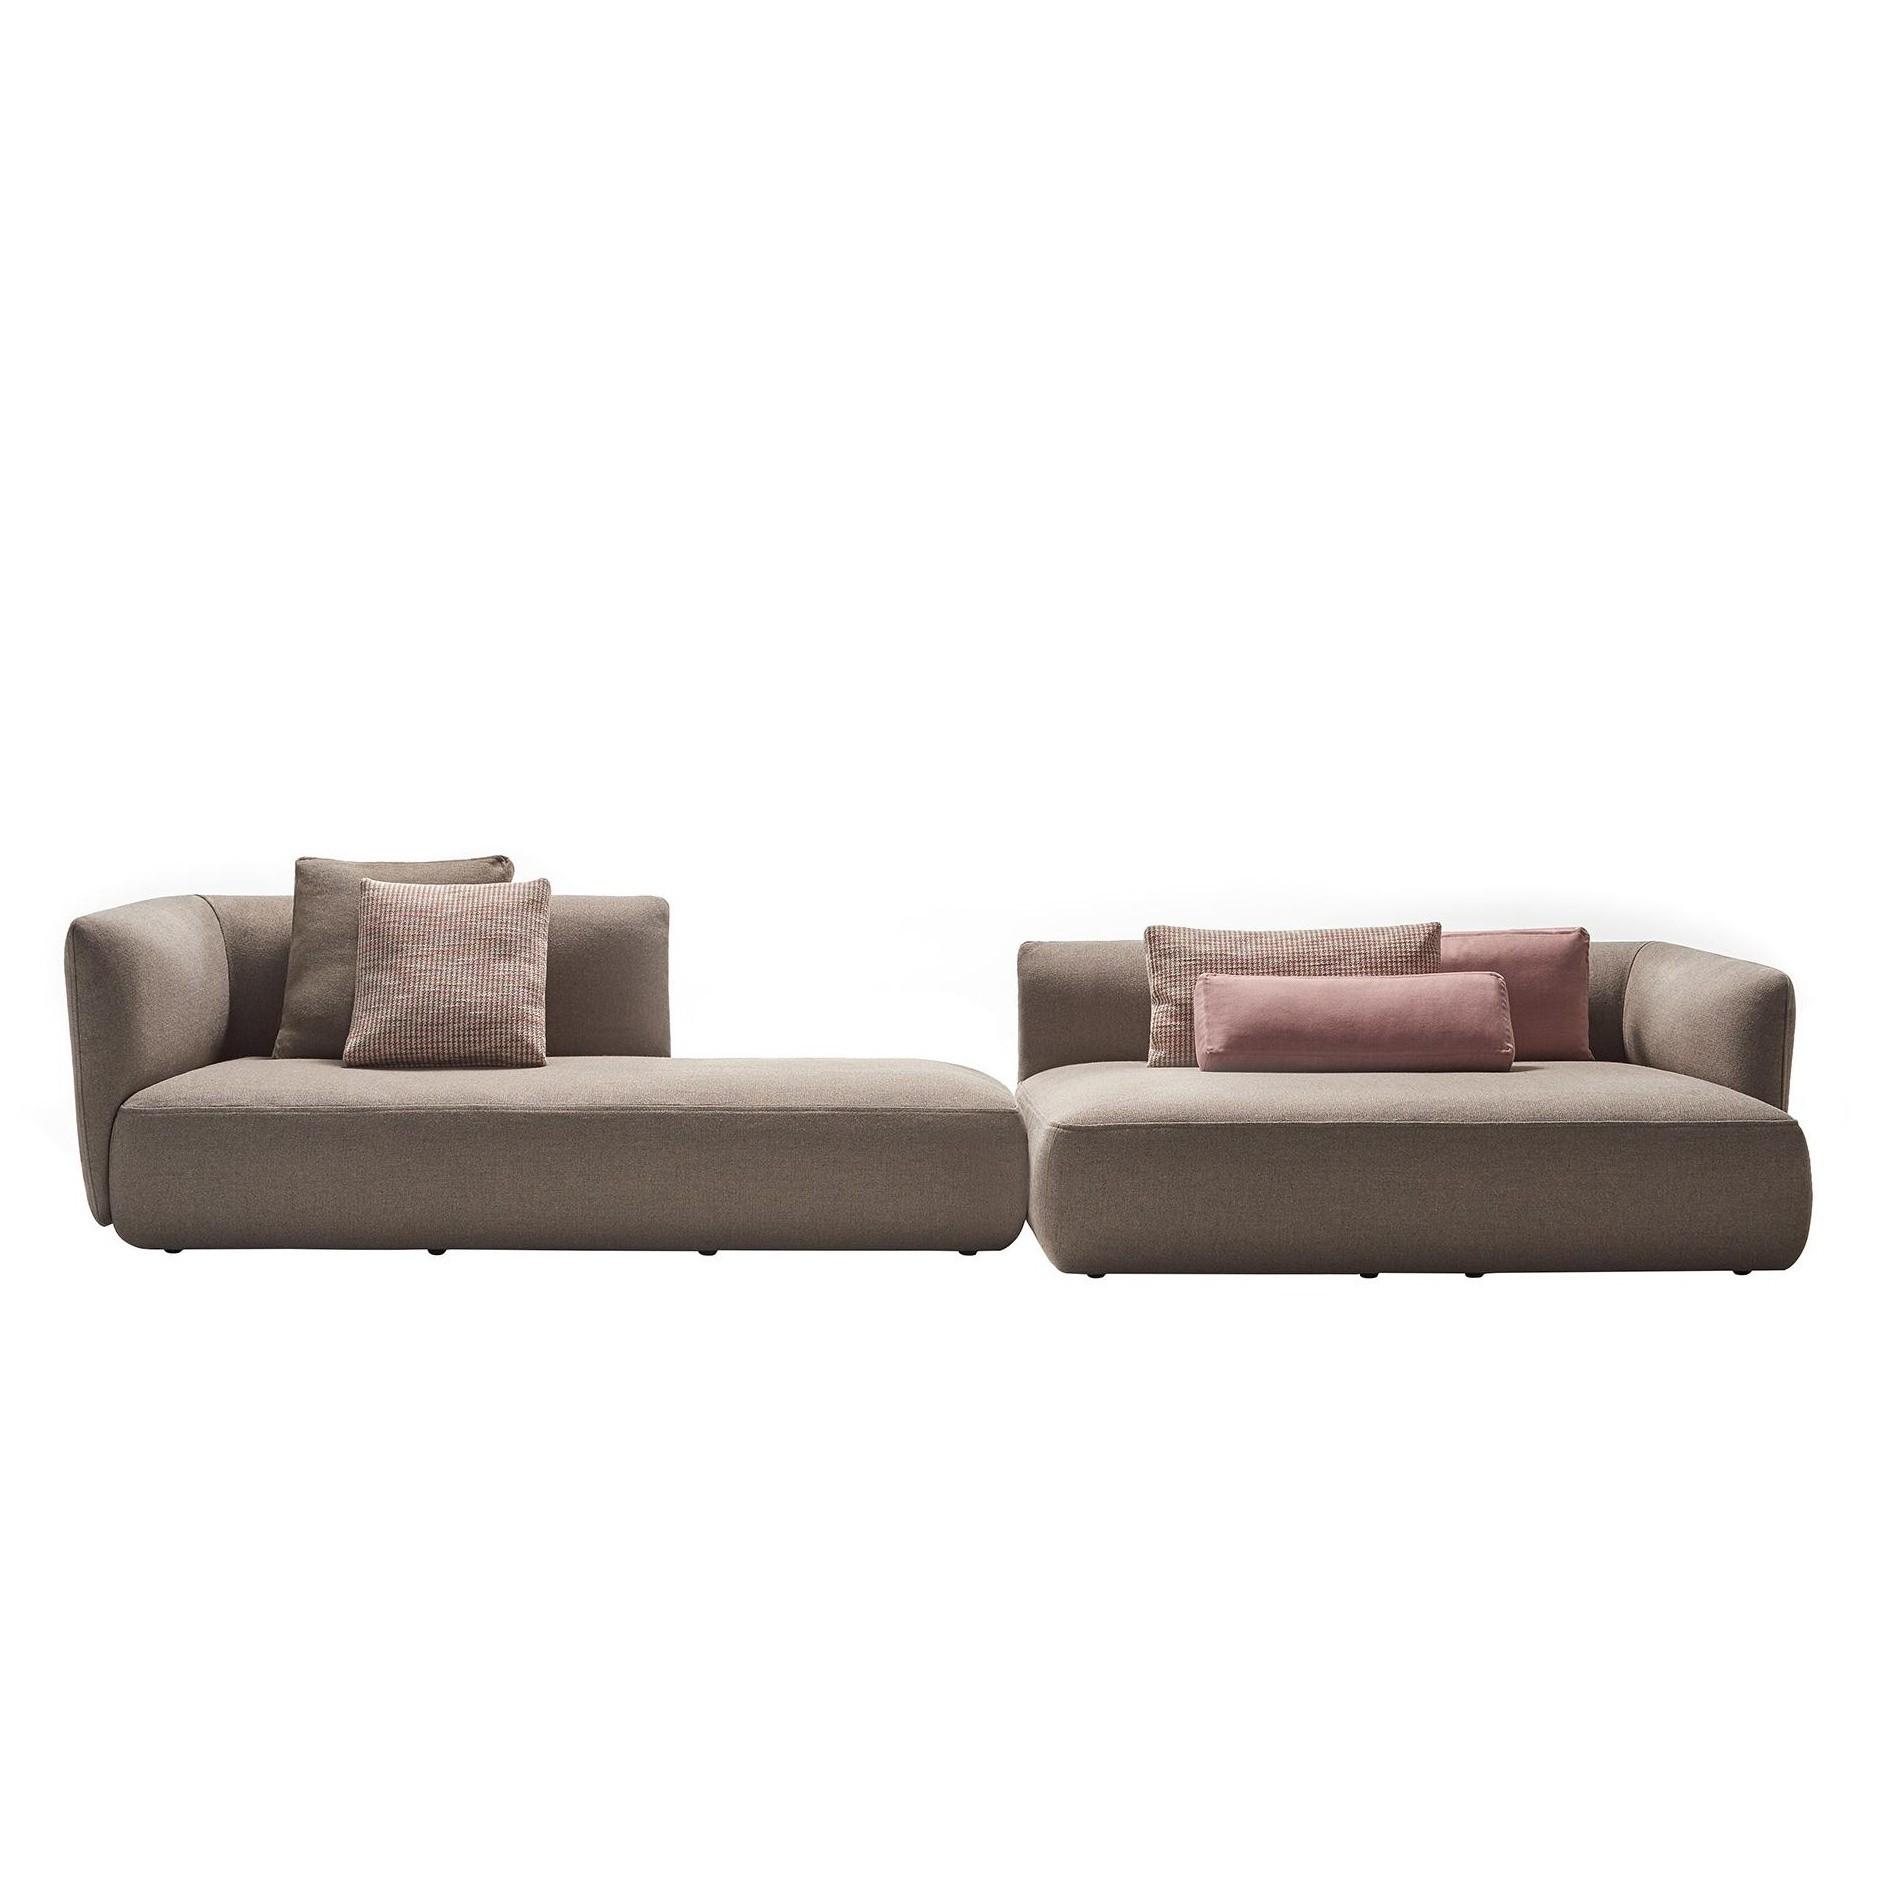 Brilliant Cosy Lounge Sofa 355X180Cm Creativecarmelina Interior Chair Design Creativecarmelinacom